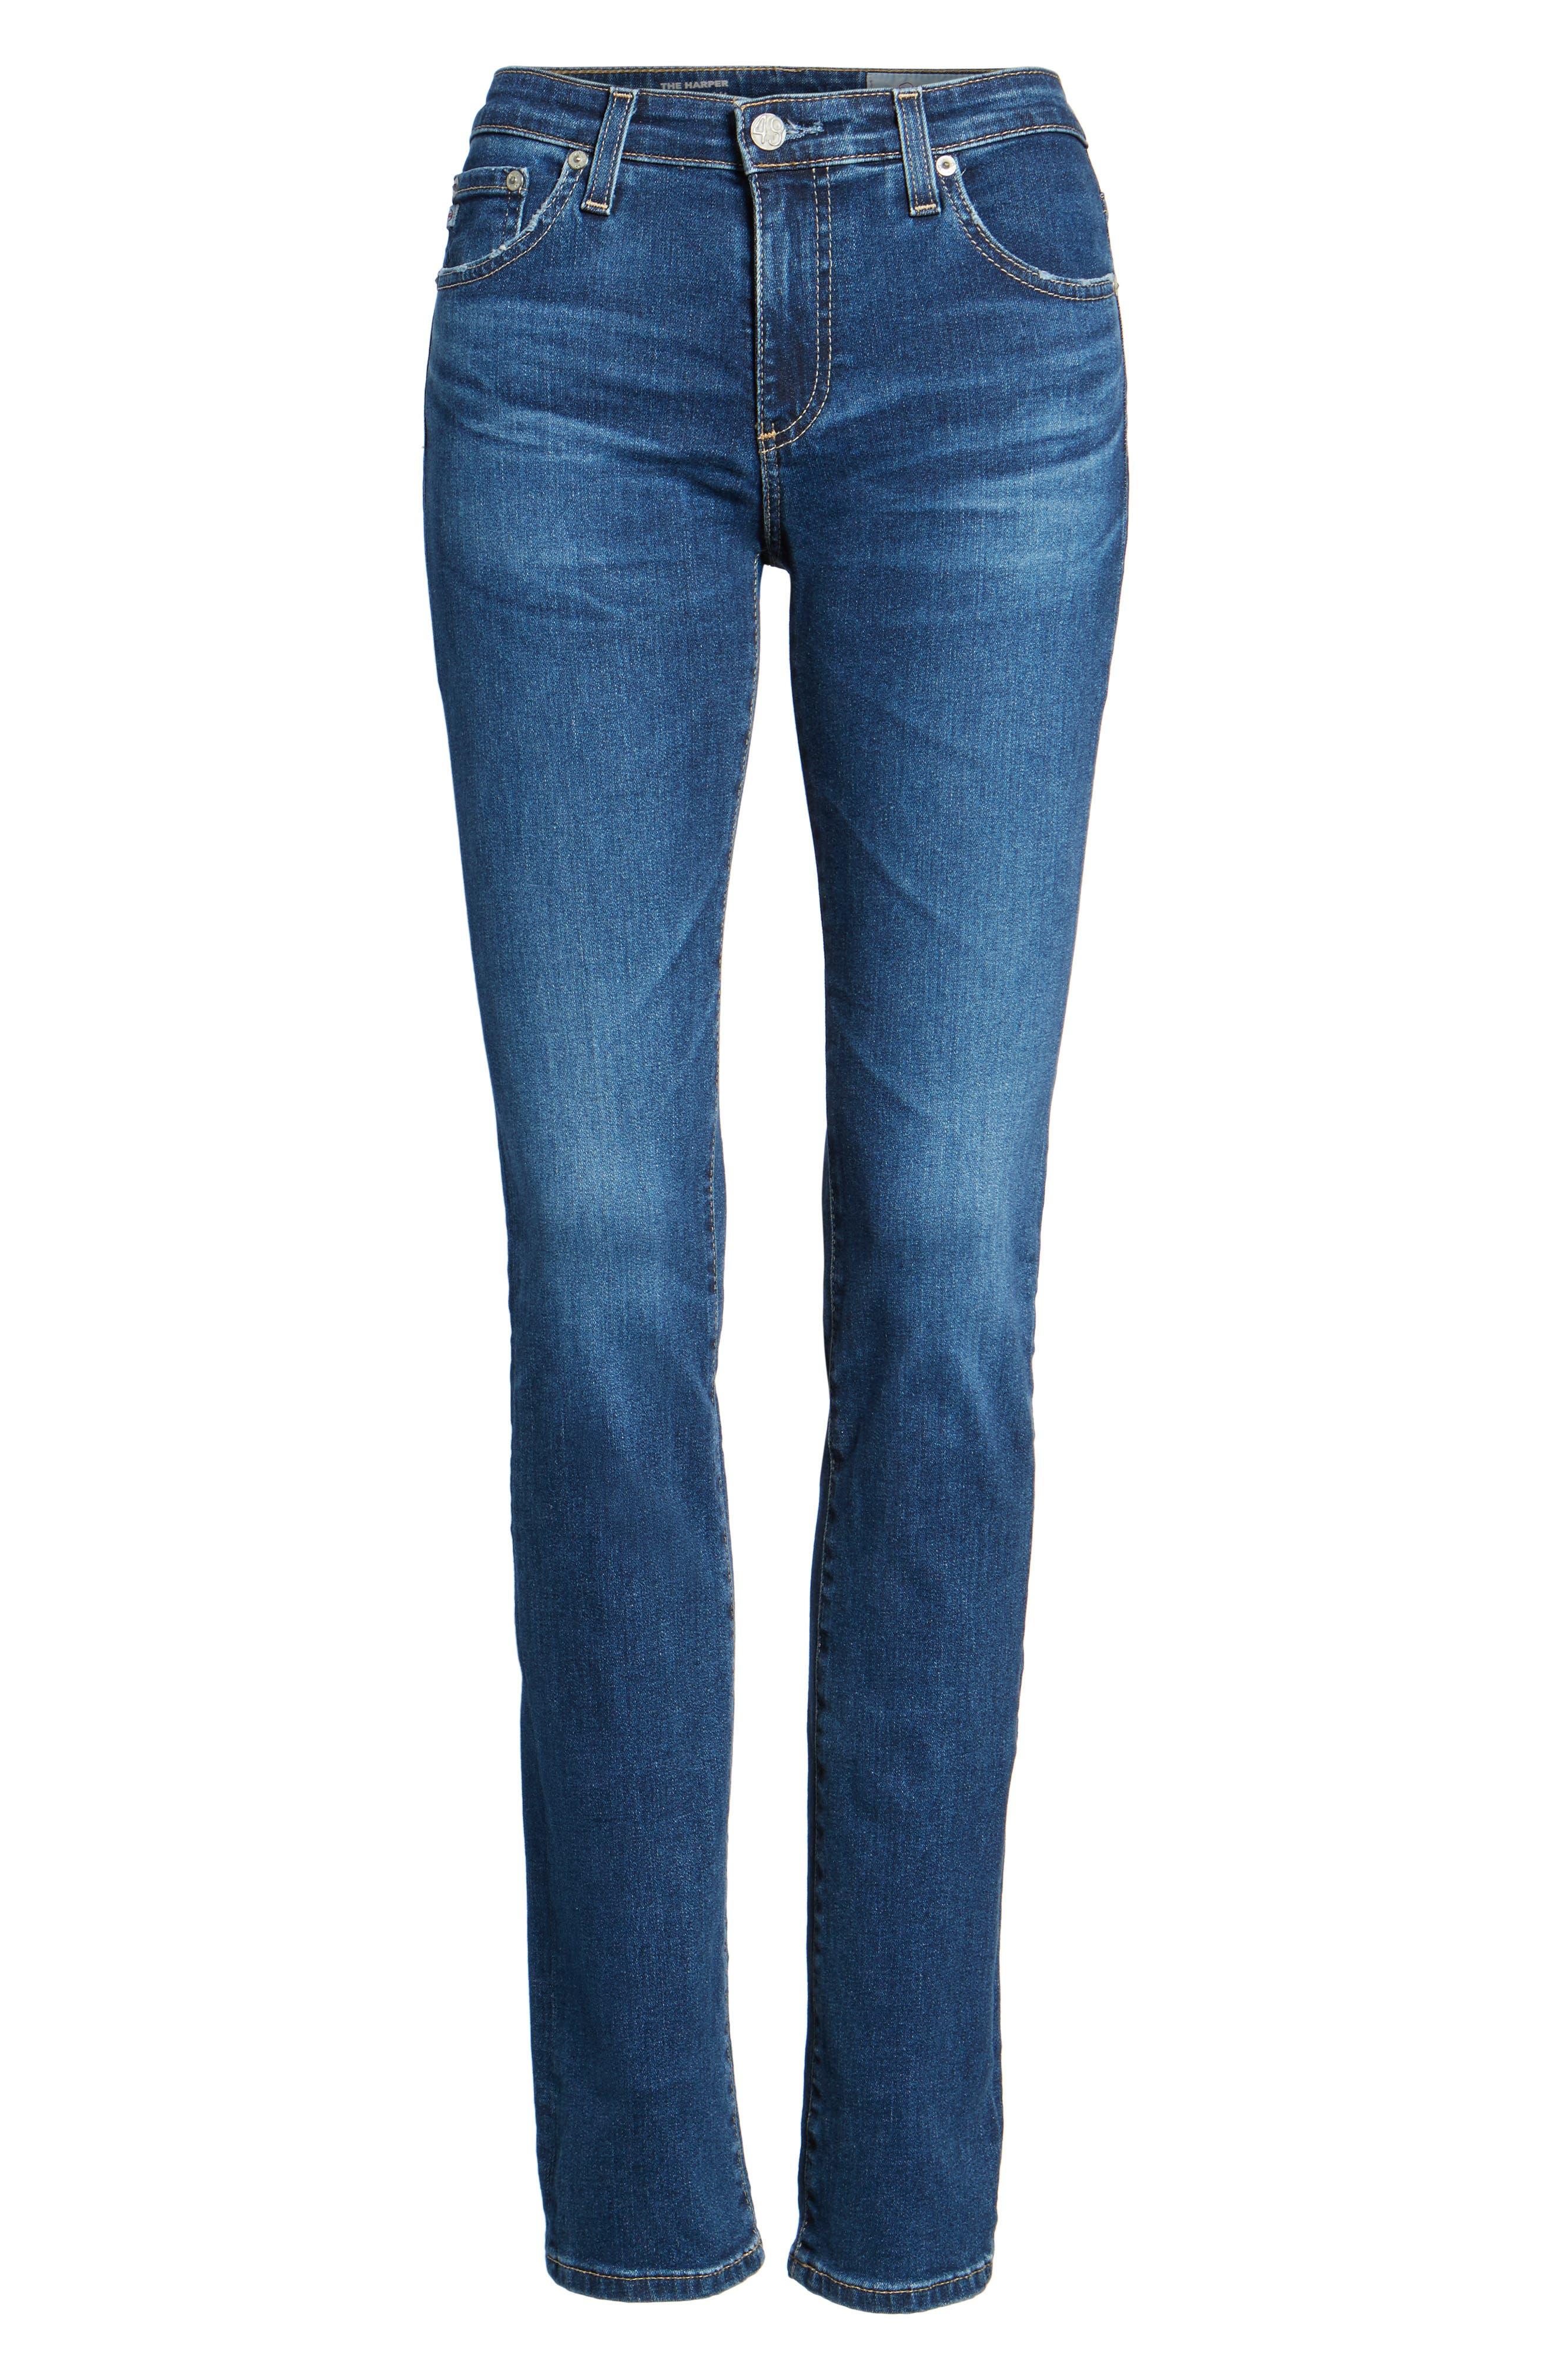 Harper Slim Straight Leg Jeans,                             Alternate thumbnail 7, color,                             8 Years Blue Portrait